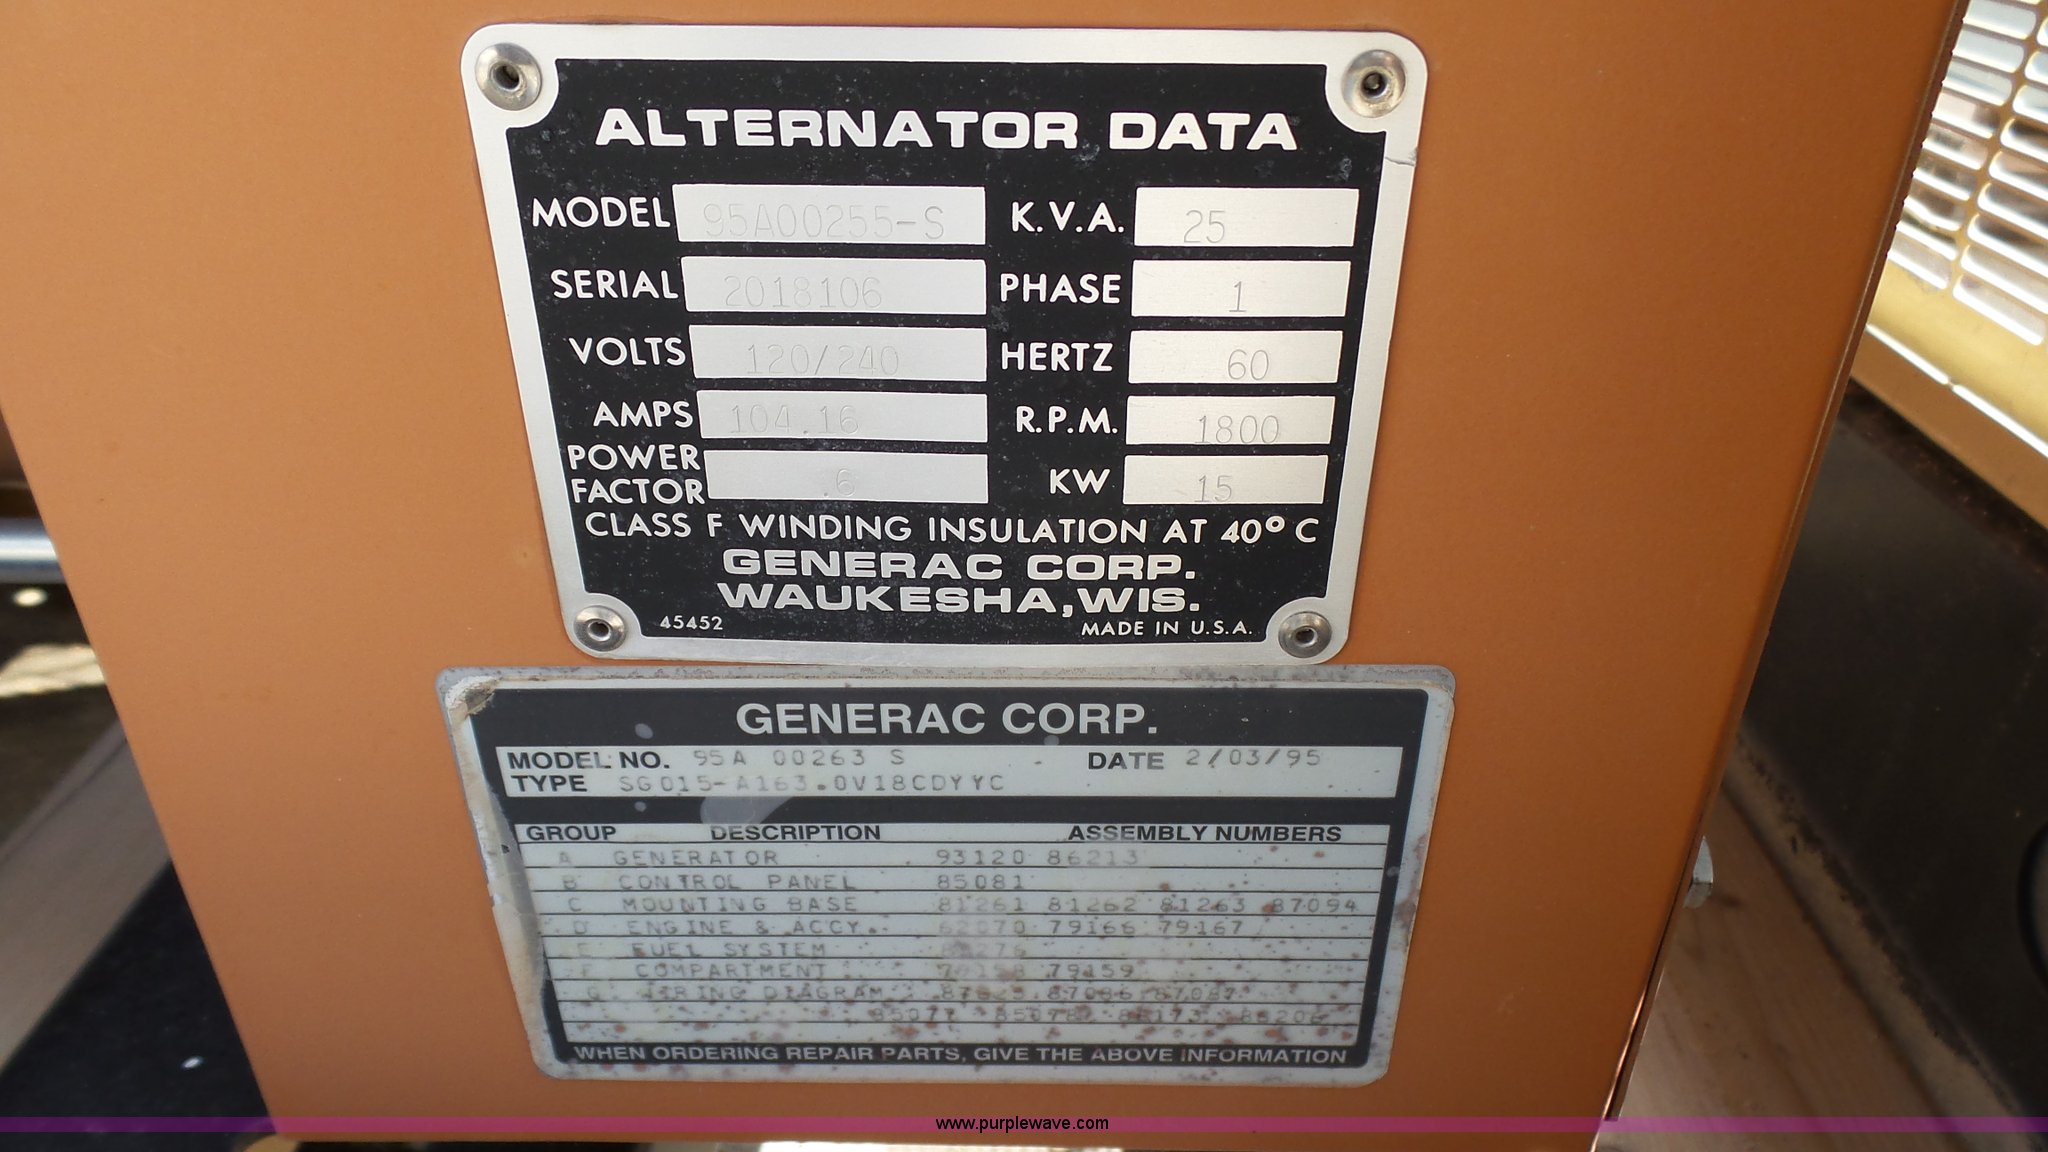 1995 Generac 95A00255-S generator | Item K4712 | SOLD! June